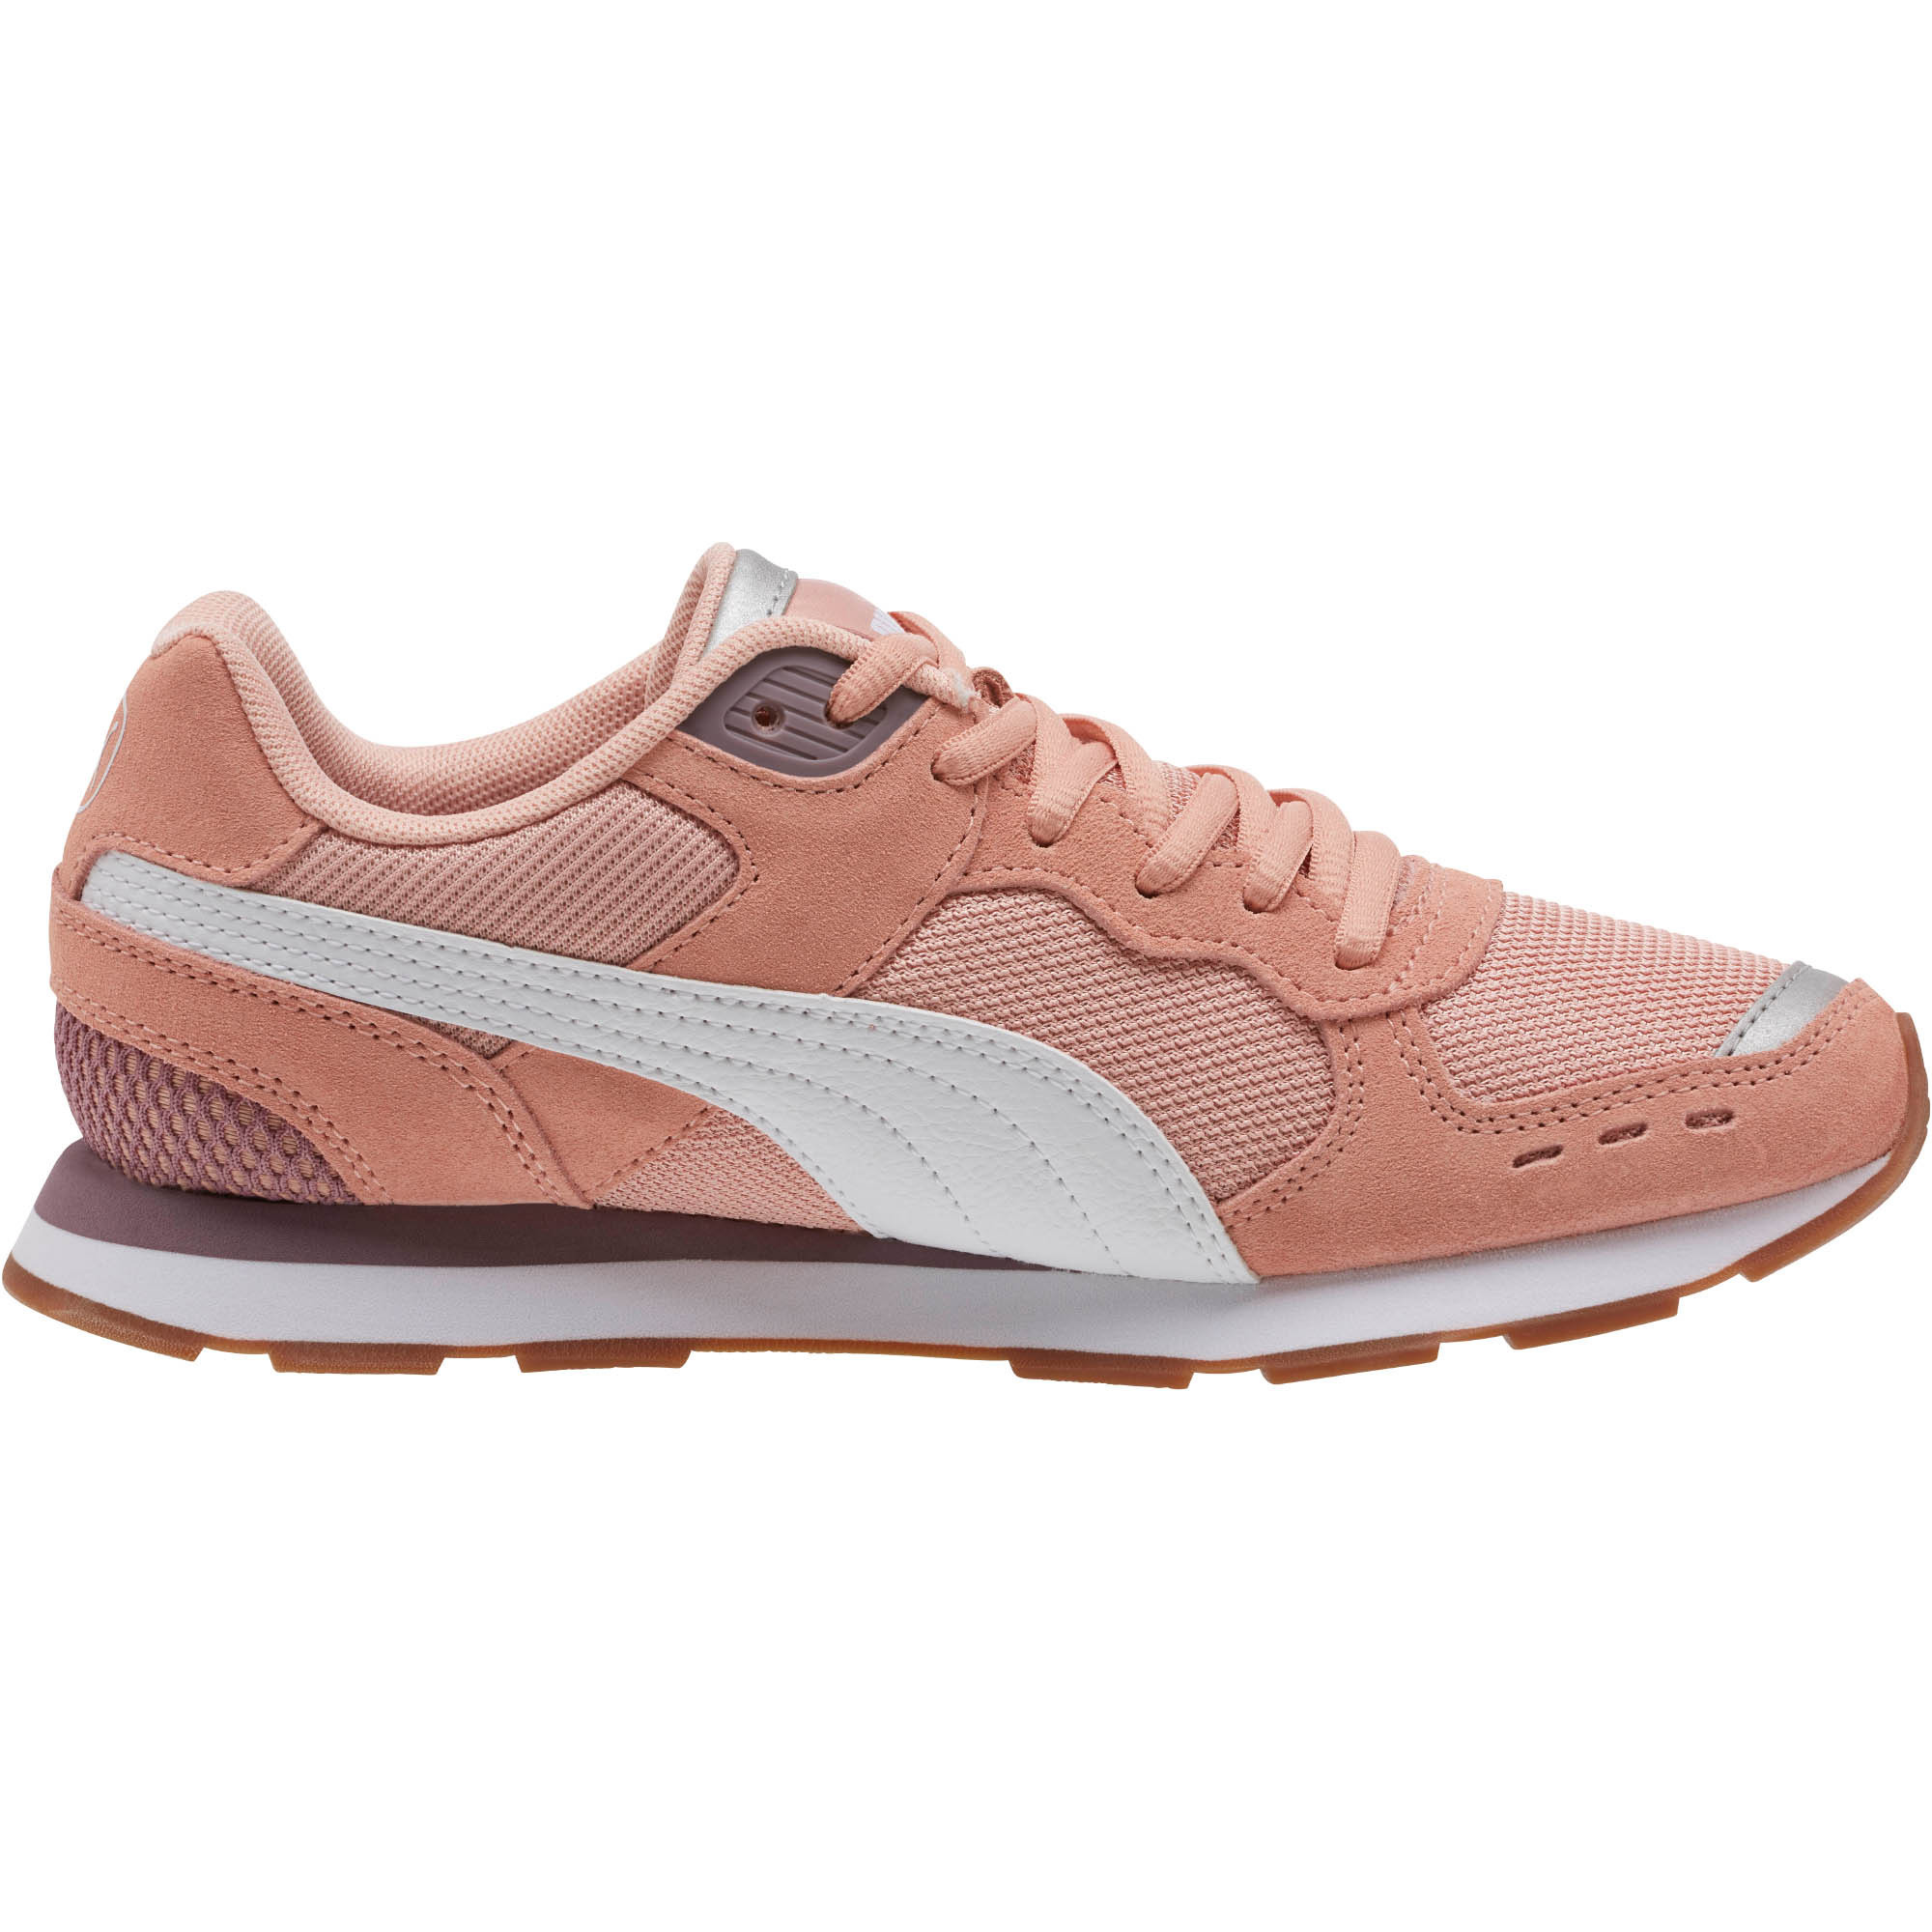 PUMA-Vista-Women-s-Sneakers-Women-Shoe-Basics thumbnail 15